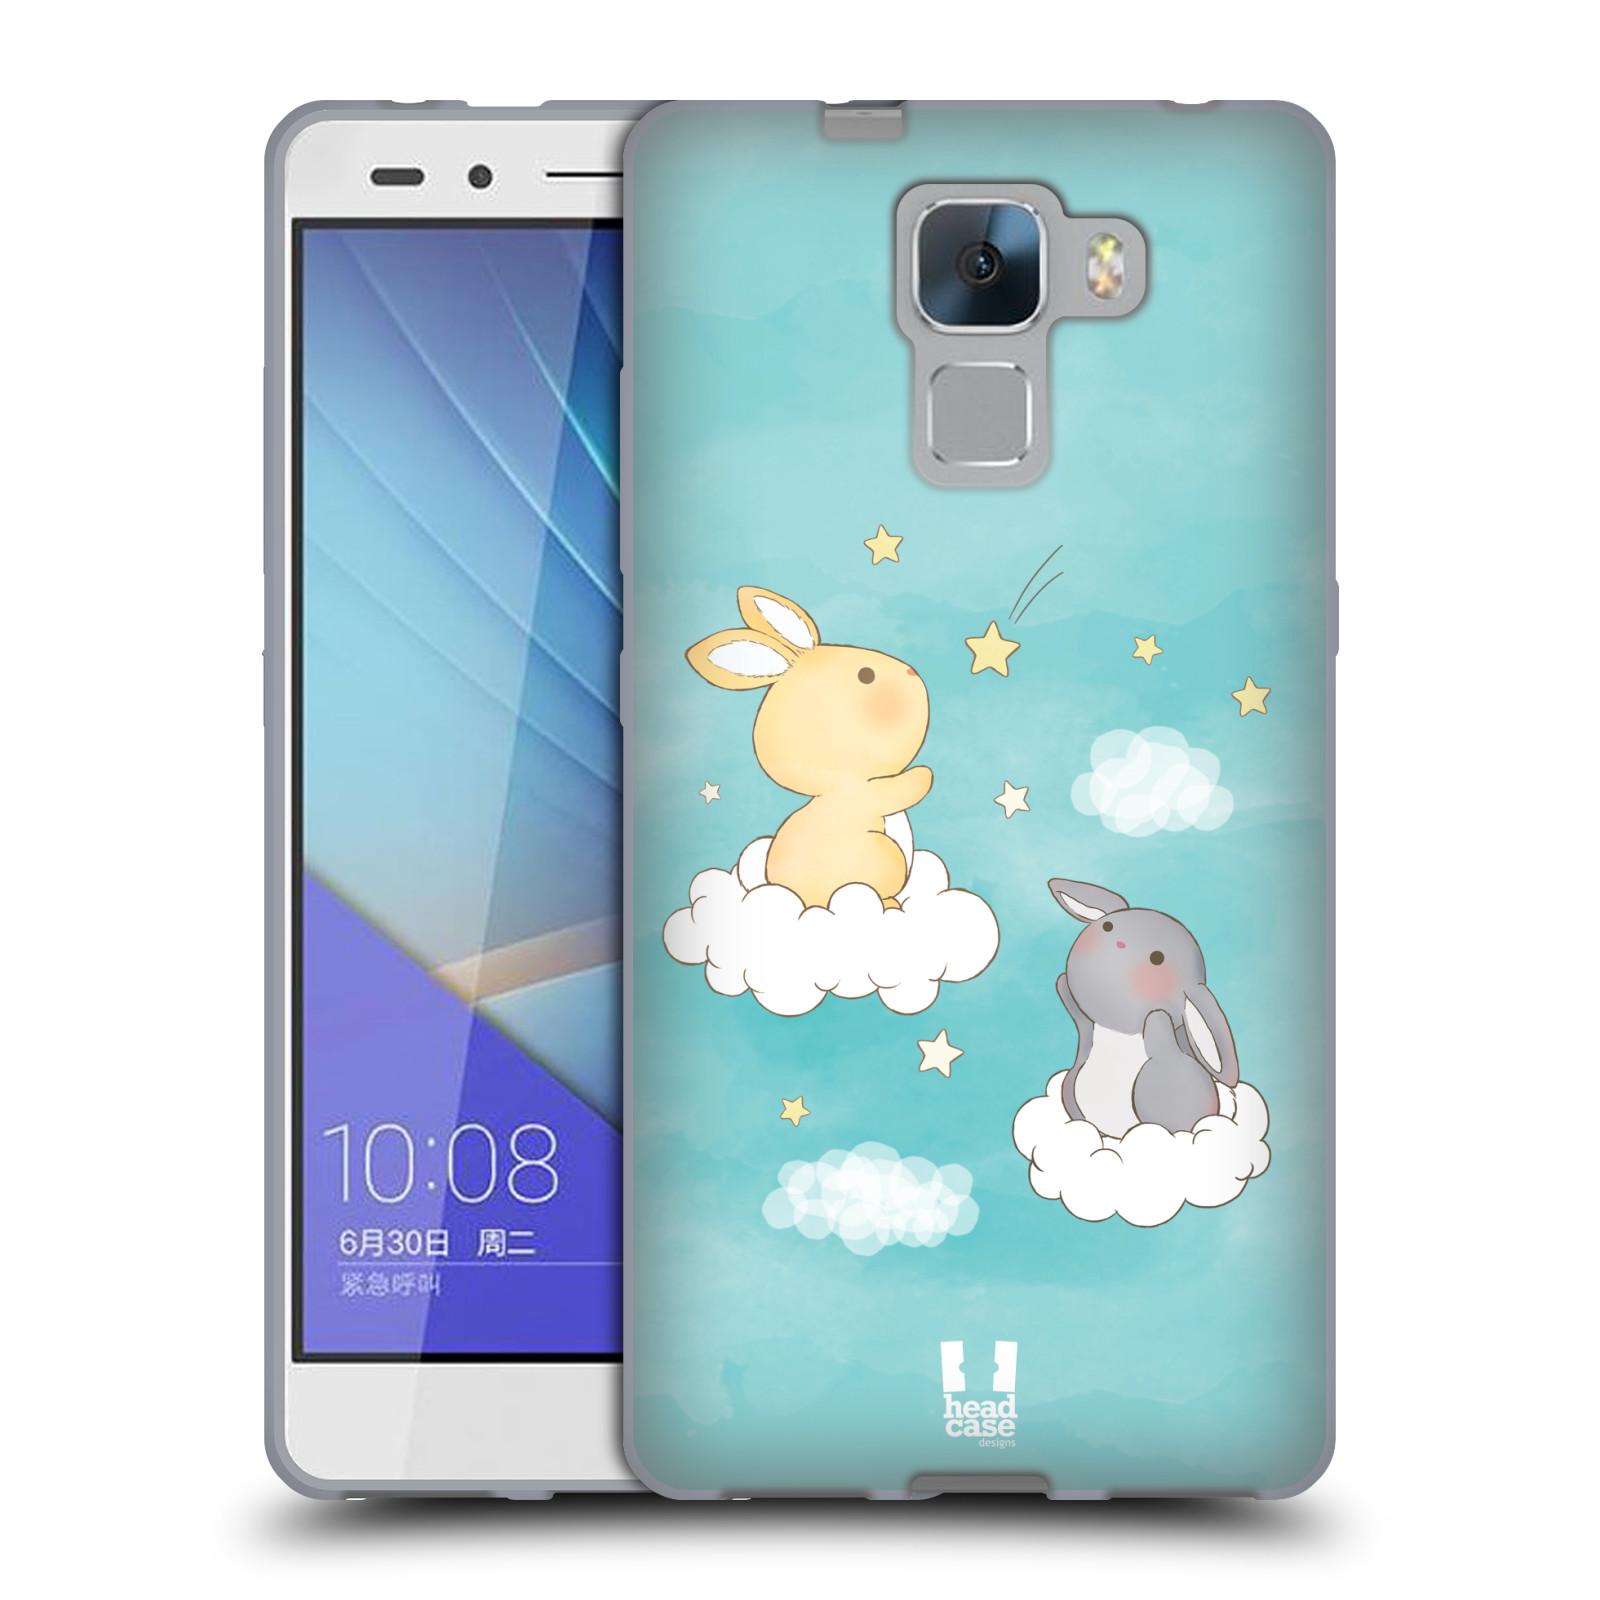 HEAD CASE silikonový obal na mobil HUAWEI HONOR 7 vzor králíček a hvězdy modrá